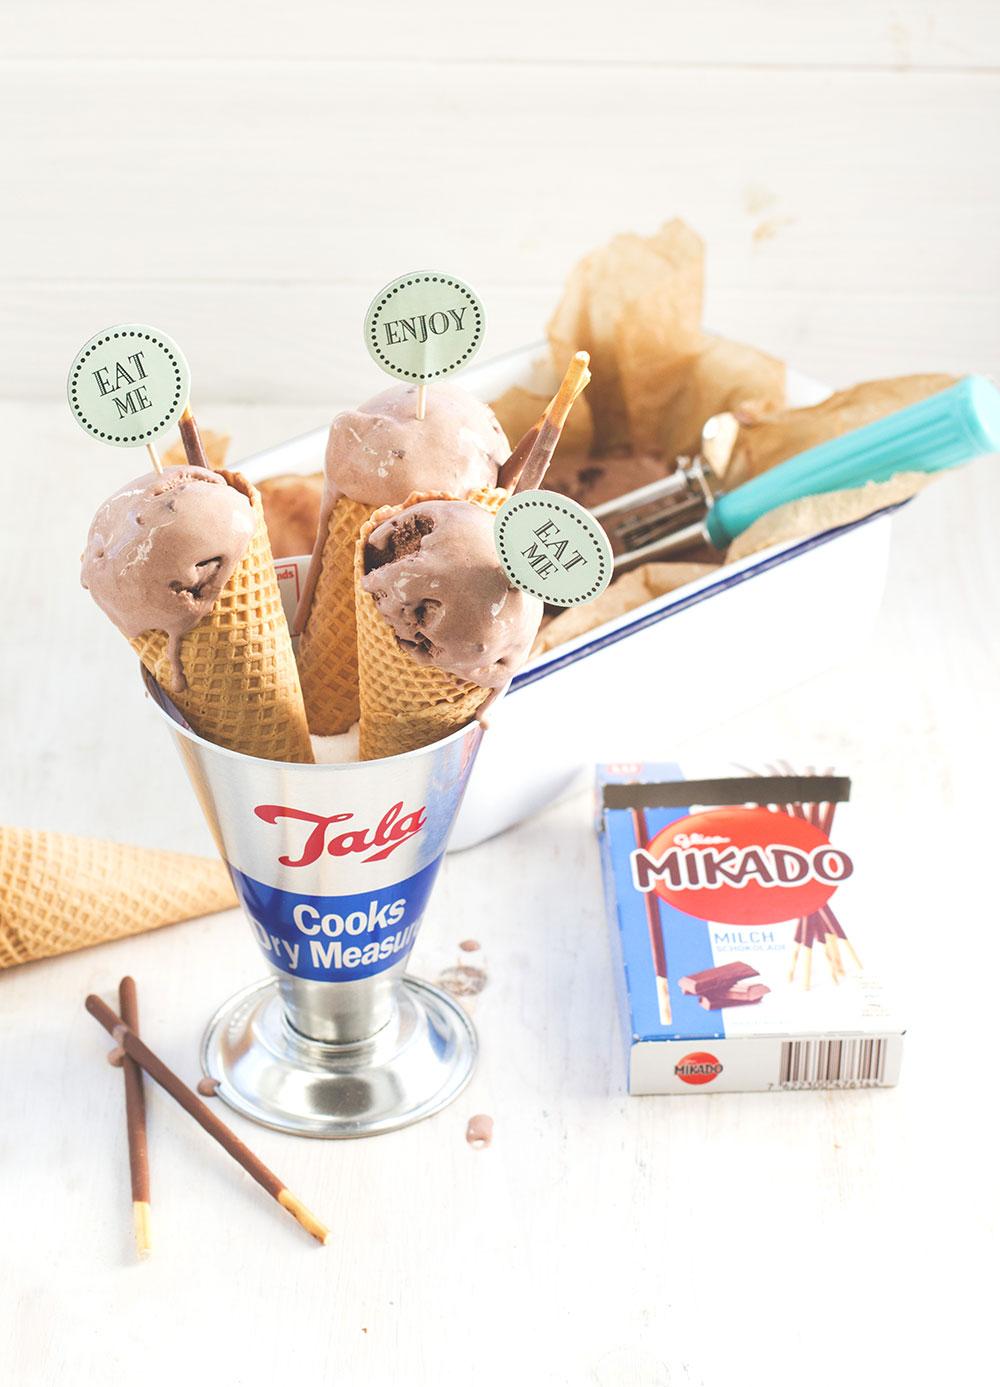 Leckeres Mikado-Schoko-Eis aus MIKADO Sticks von moeyskitchen.com